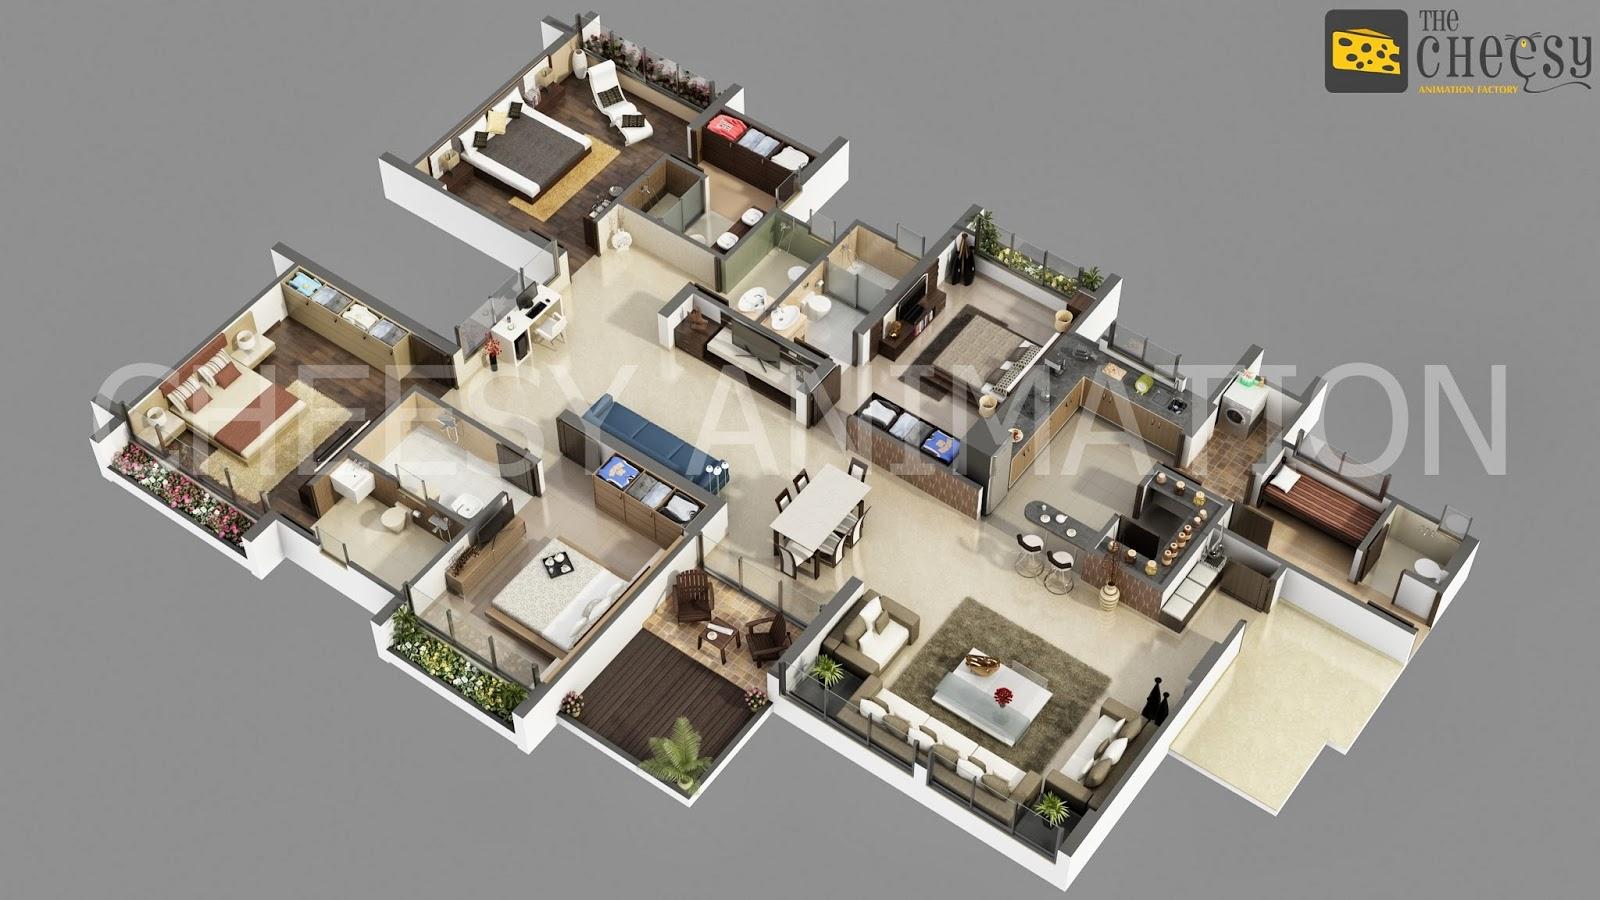 3d Floor Plan 3d Floor Plan Rendering Saves Time And Money